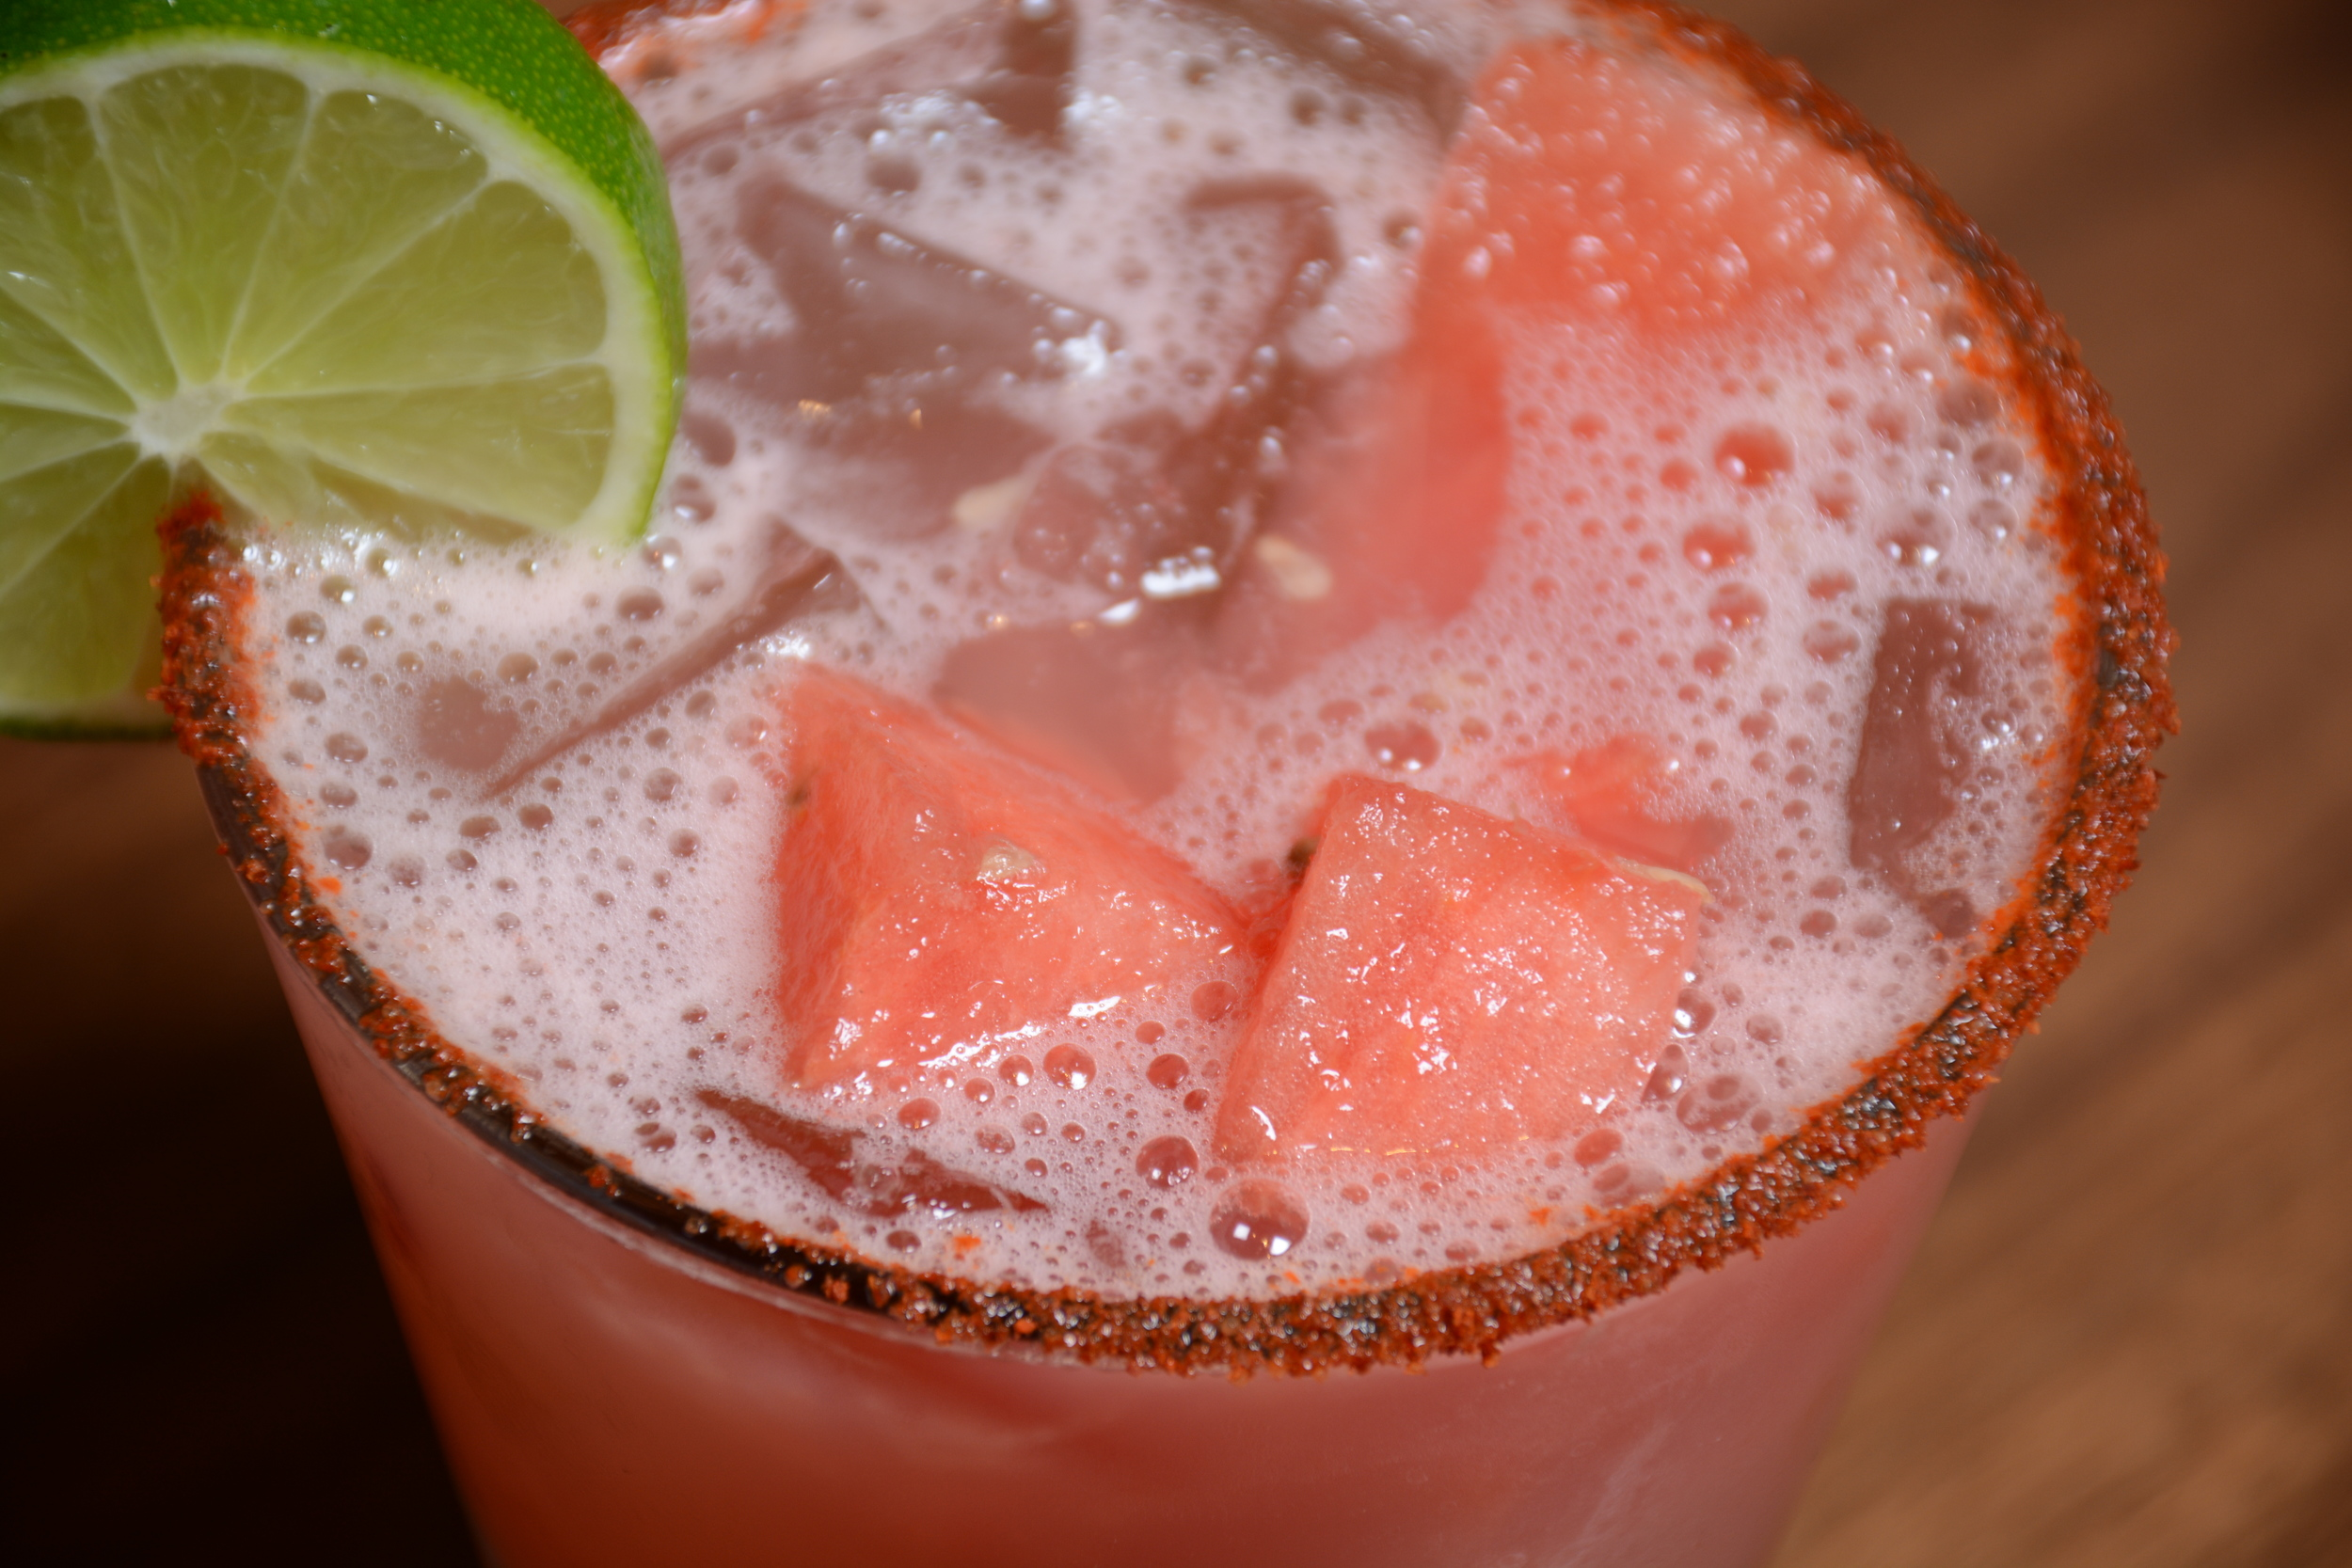 SOL Cocina - Watermelon Margarita 7.jpg